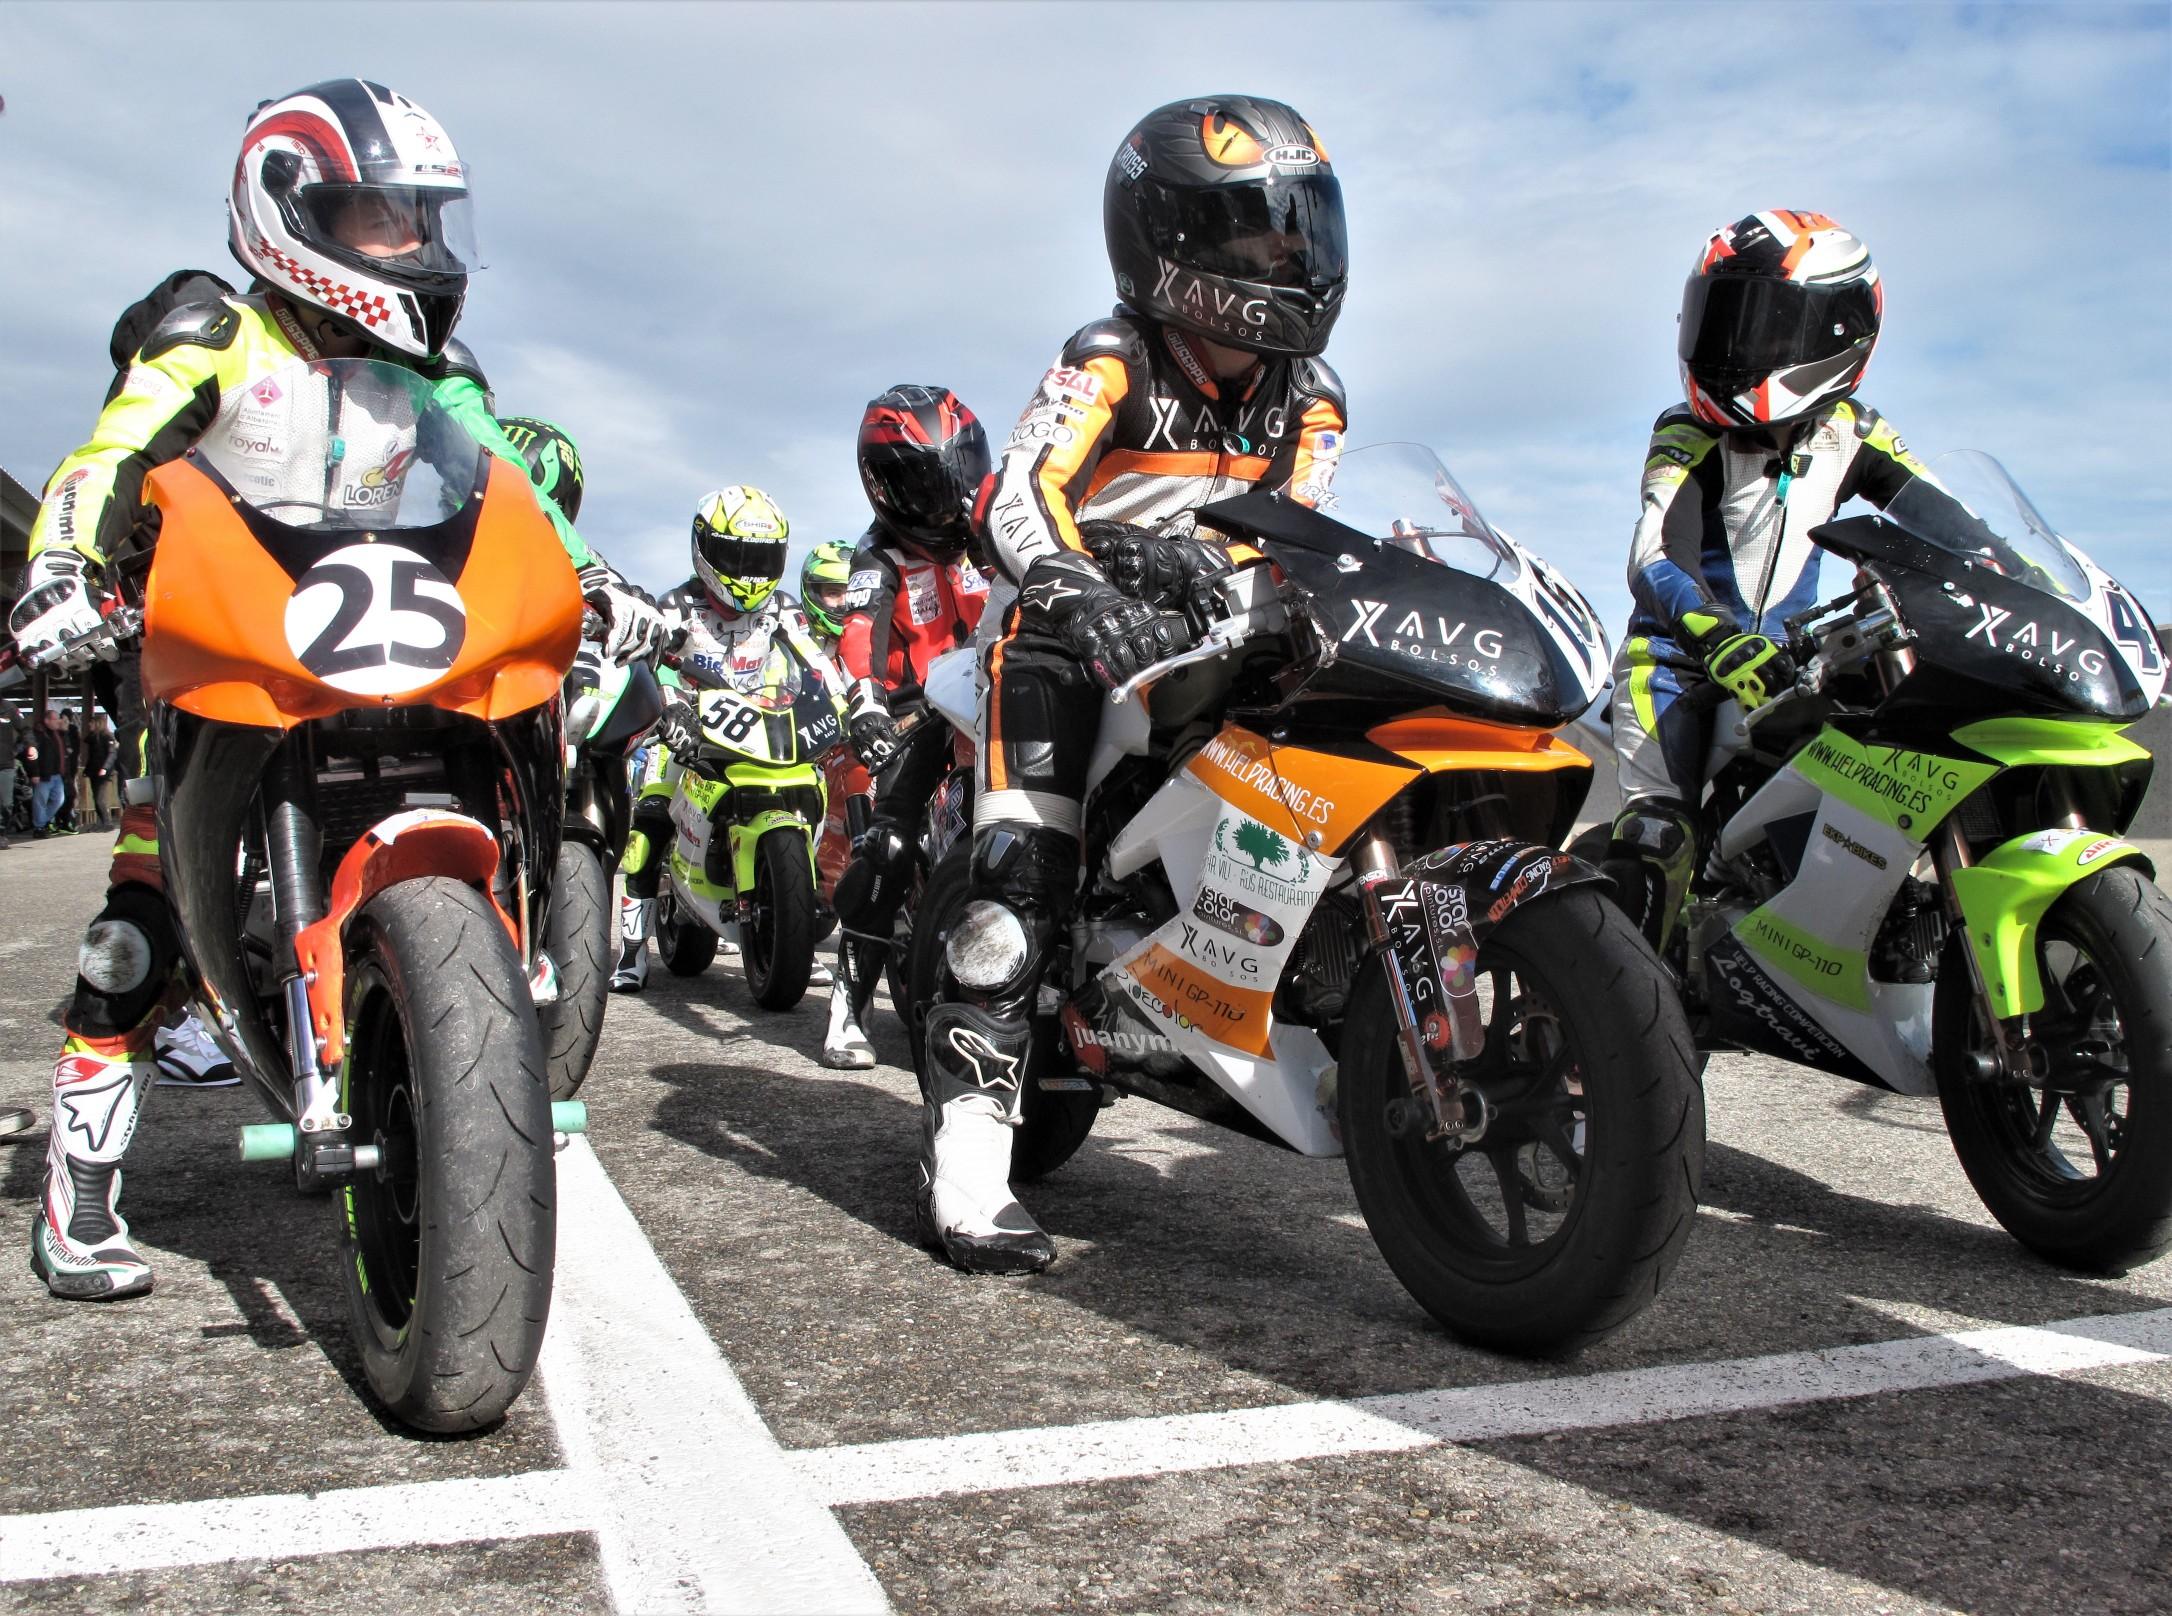 Circuito De Alcarras : Federació catalana de motociclisme